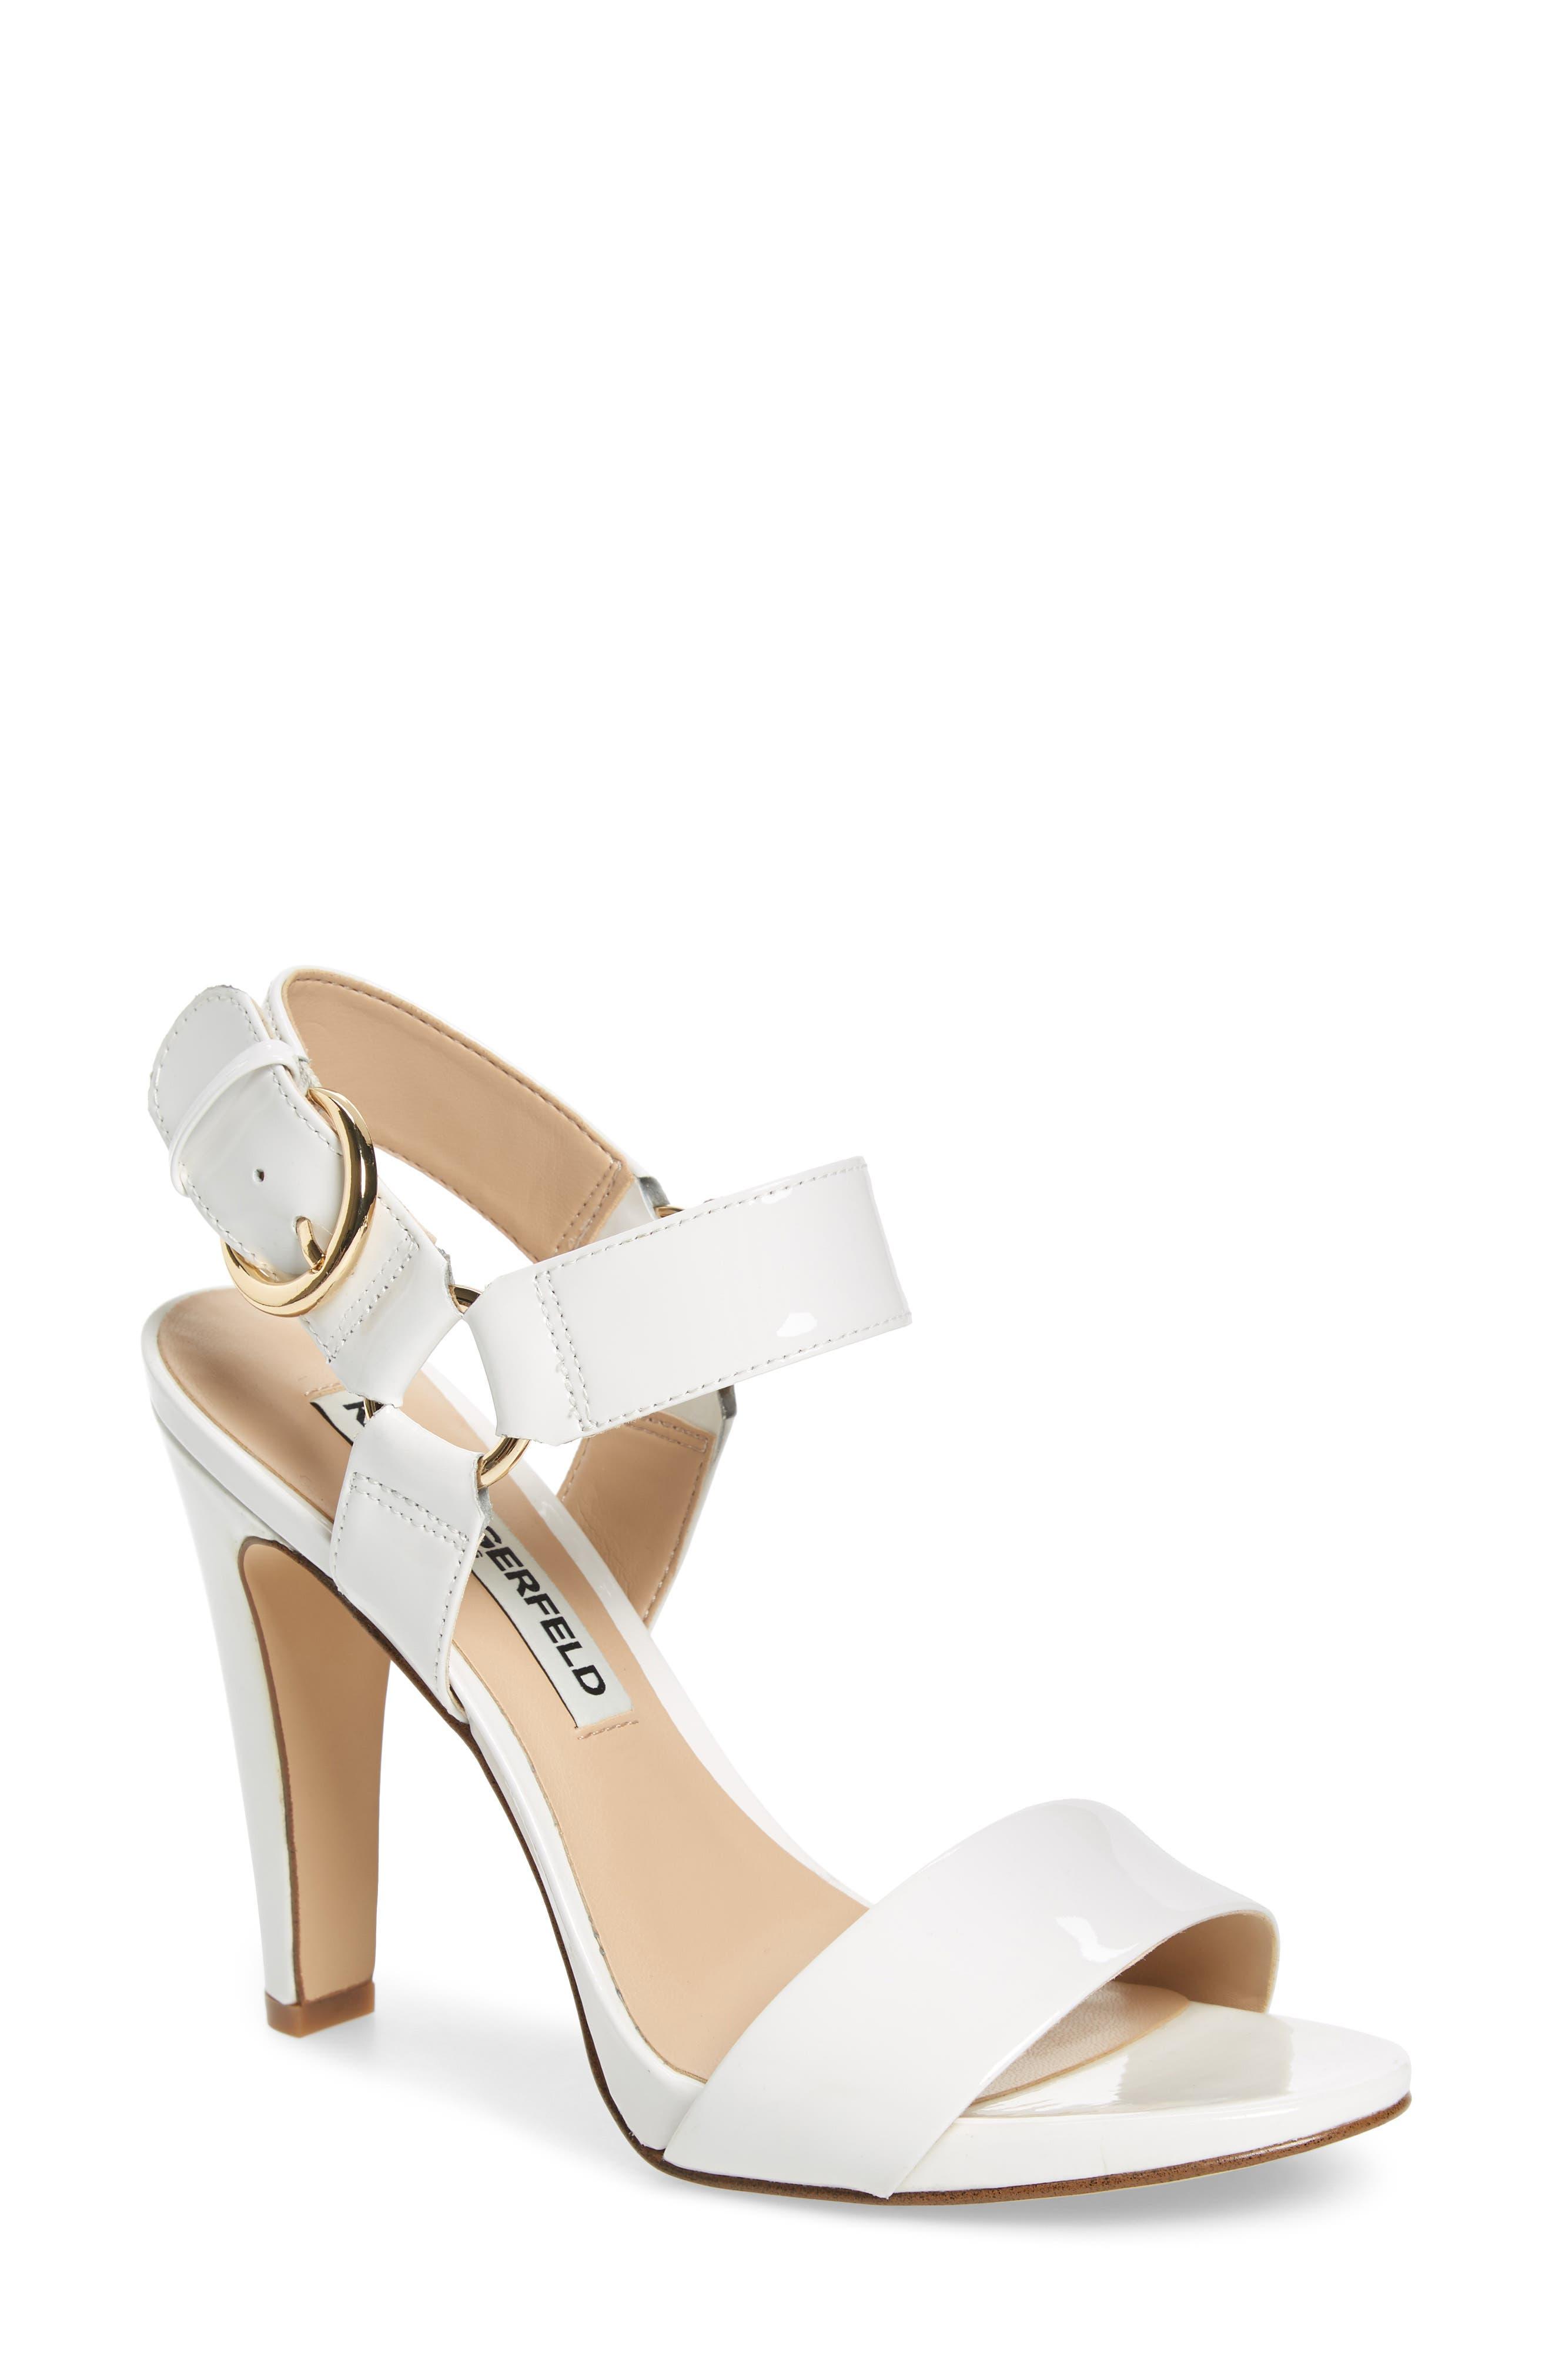 Karl Lagerfeld Paris Cieone Sandal- White